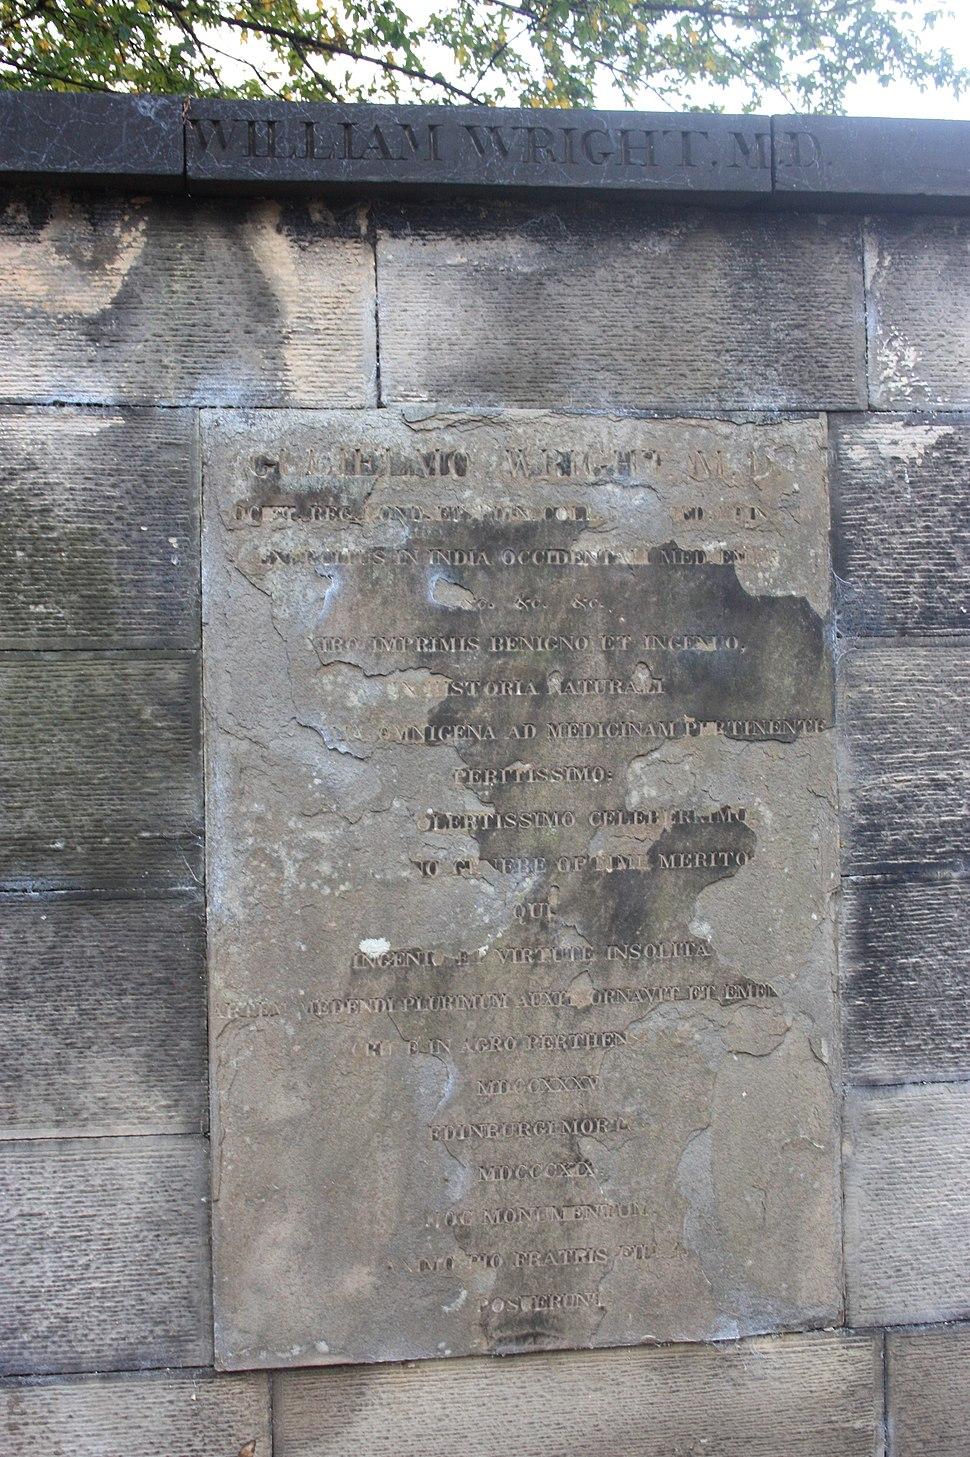 The grave of Dr William Wright, Greyfriars Kirkyard, Edinburgh